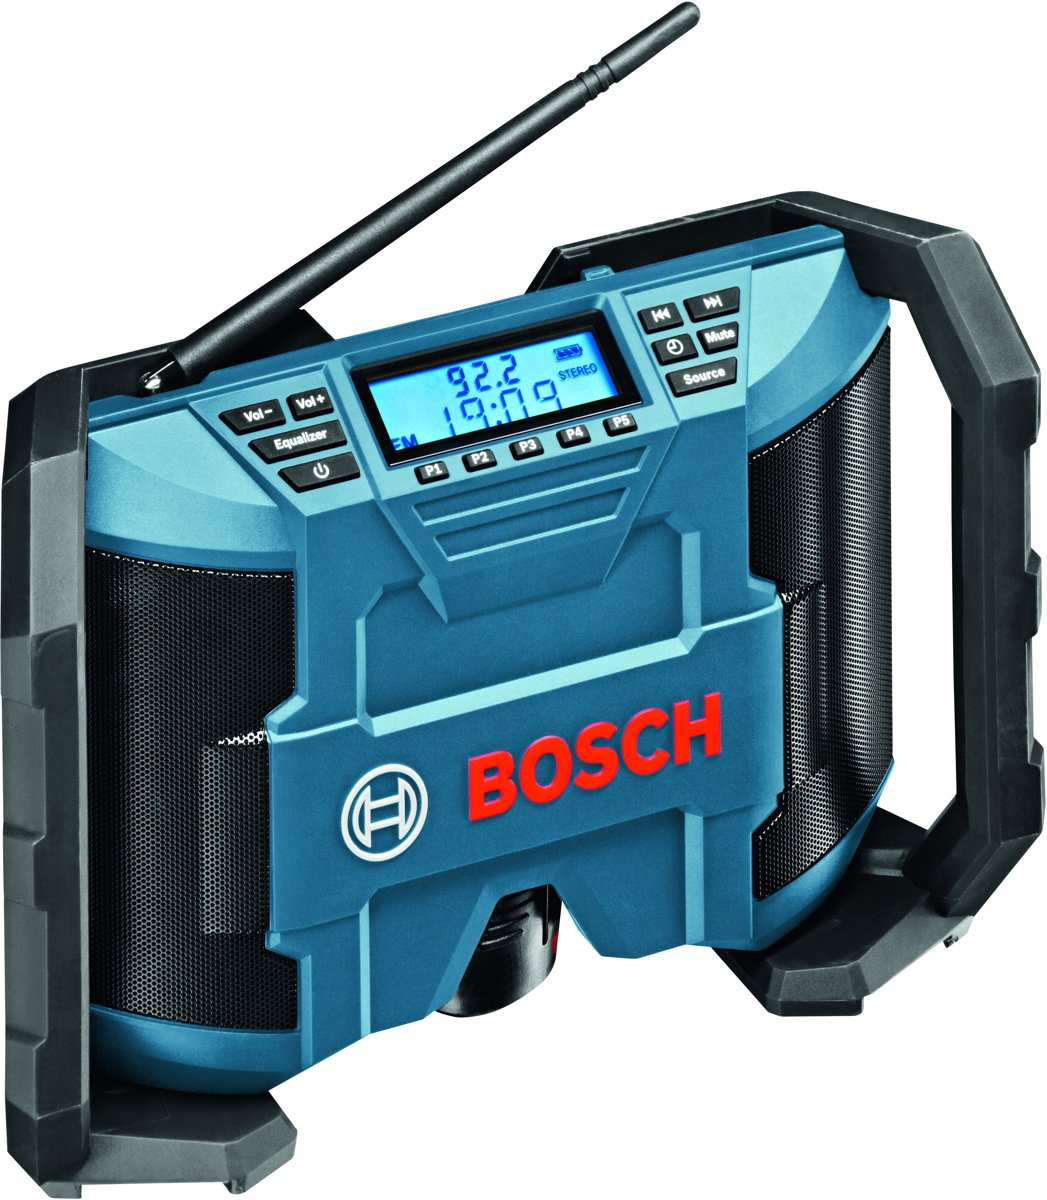 Bosch Professional GML 10,8 V-LI FM Bouwradio Blauw, Zwart